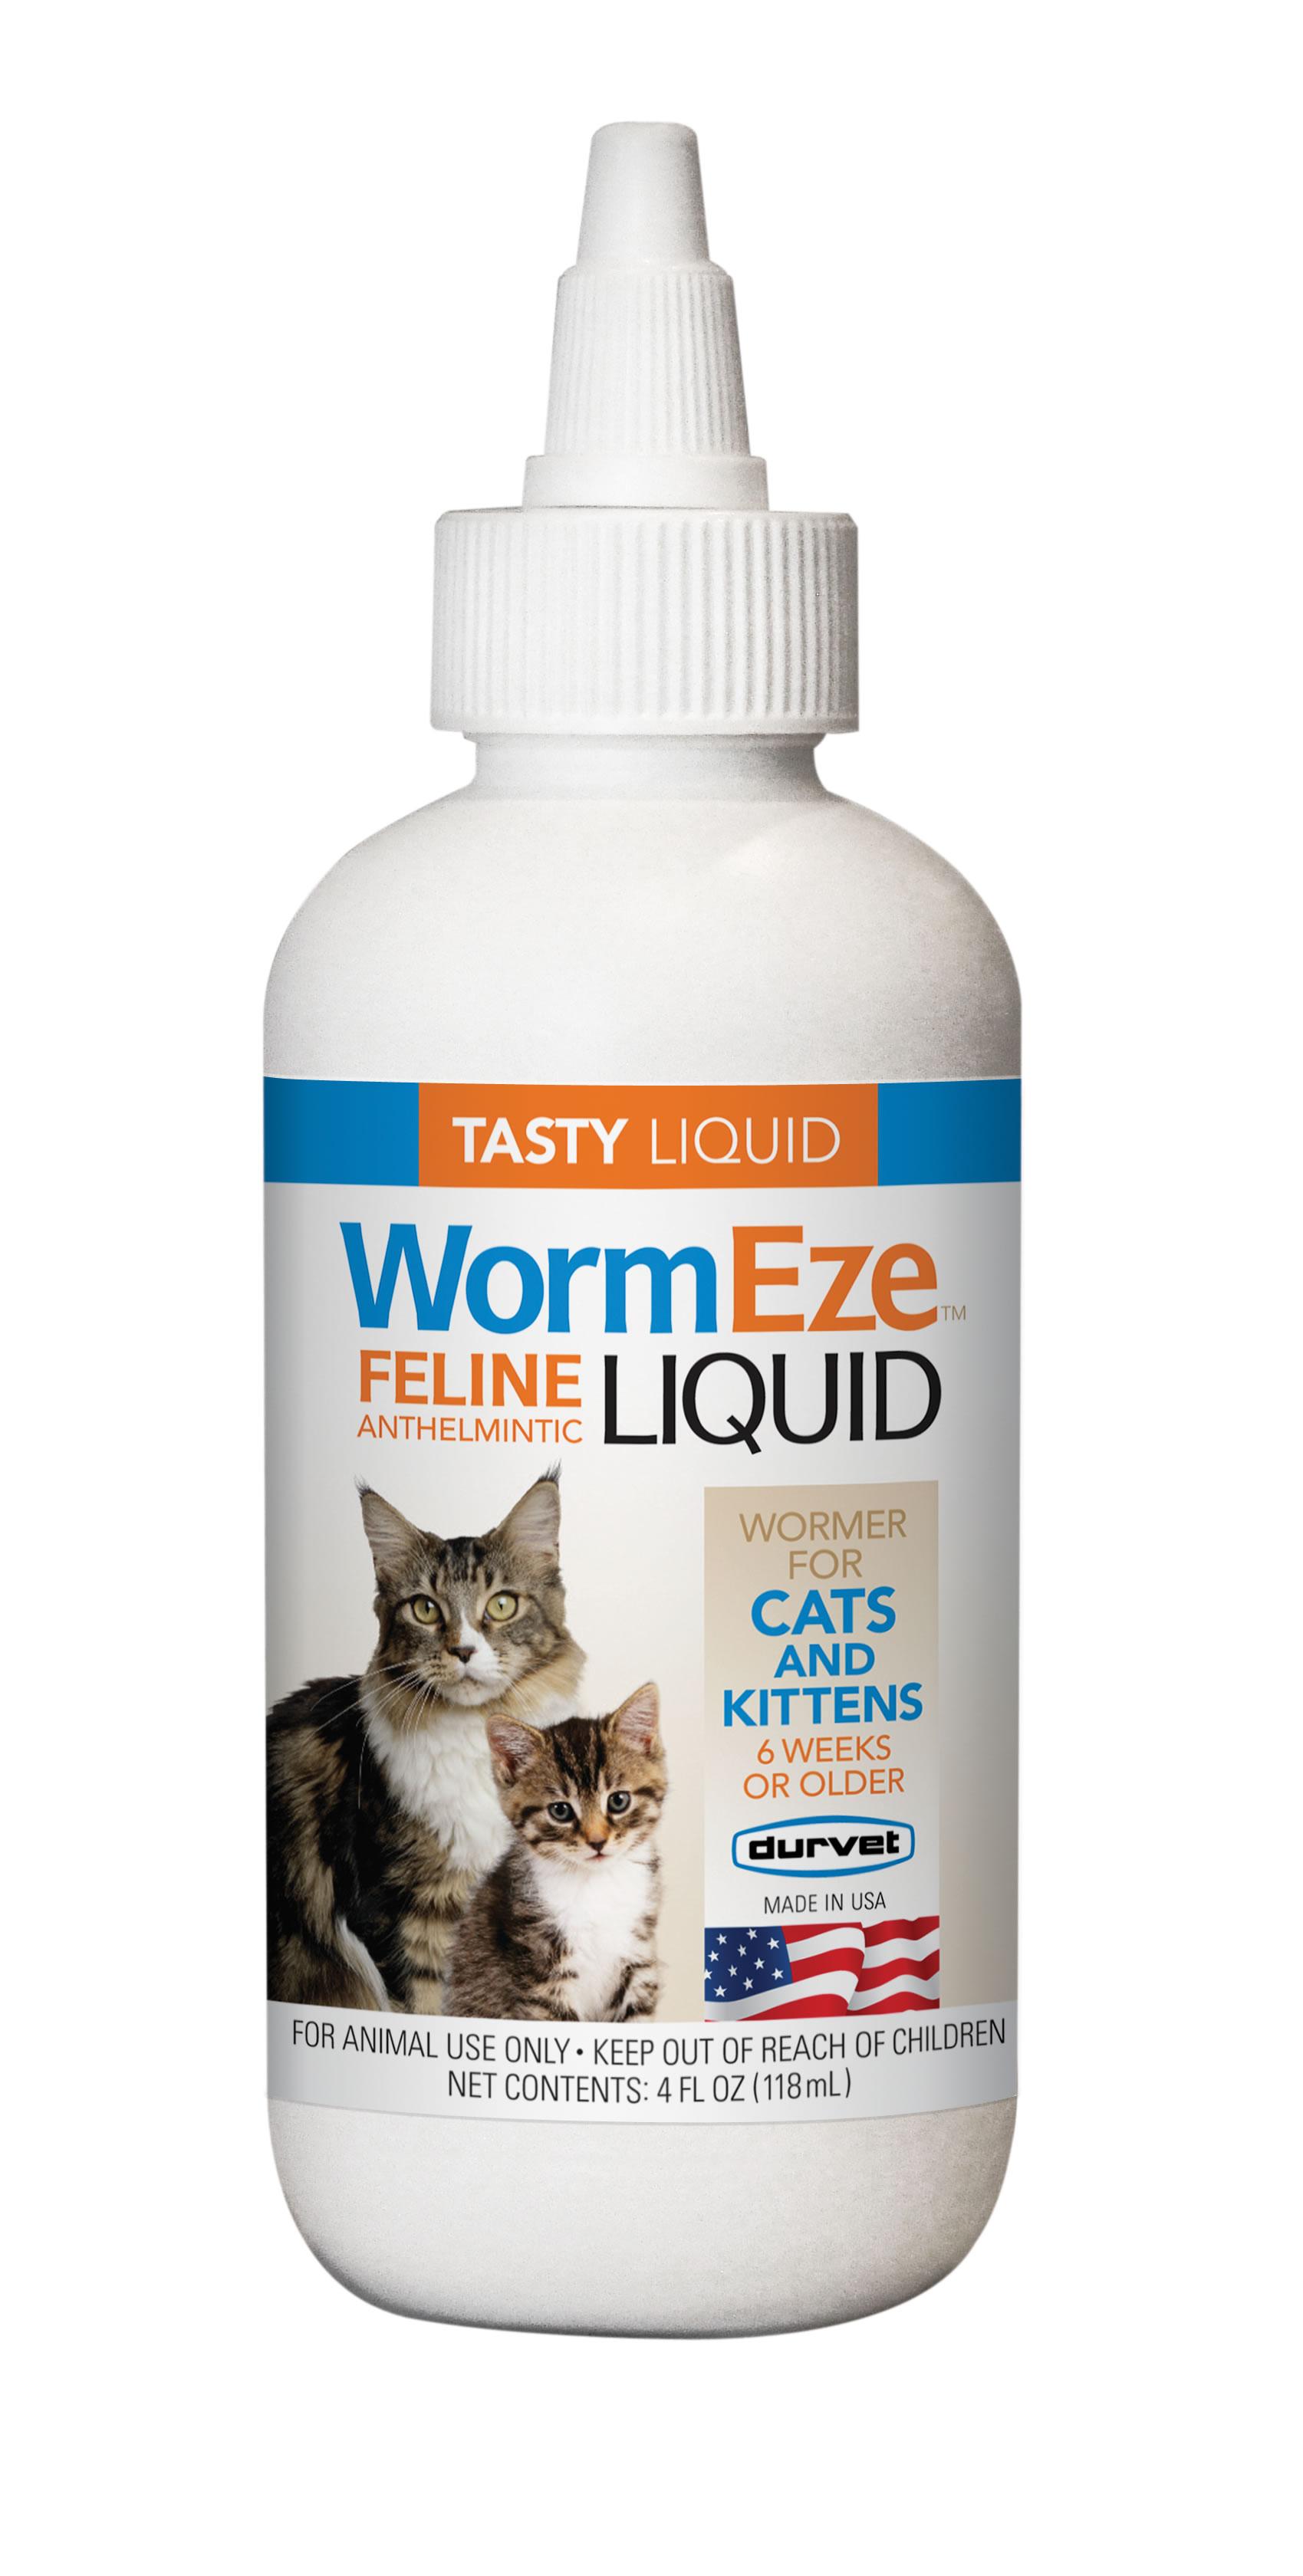 Wormeze Liquid For Cats Kittens Durvet